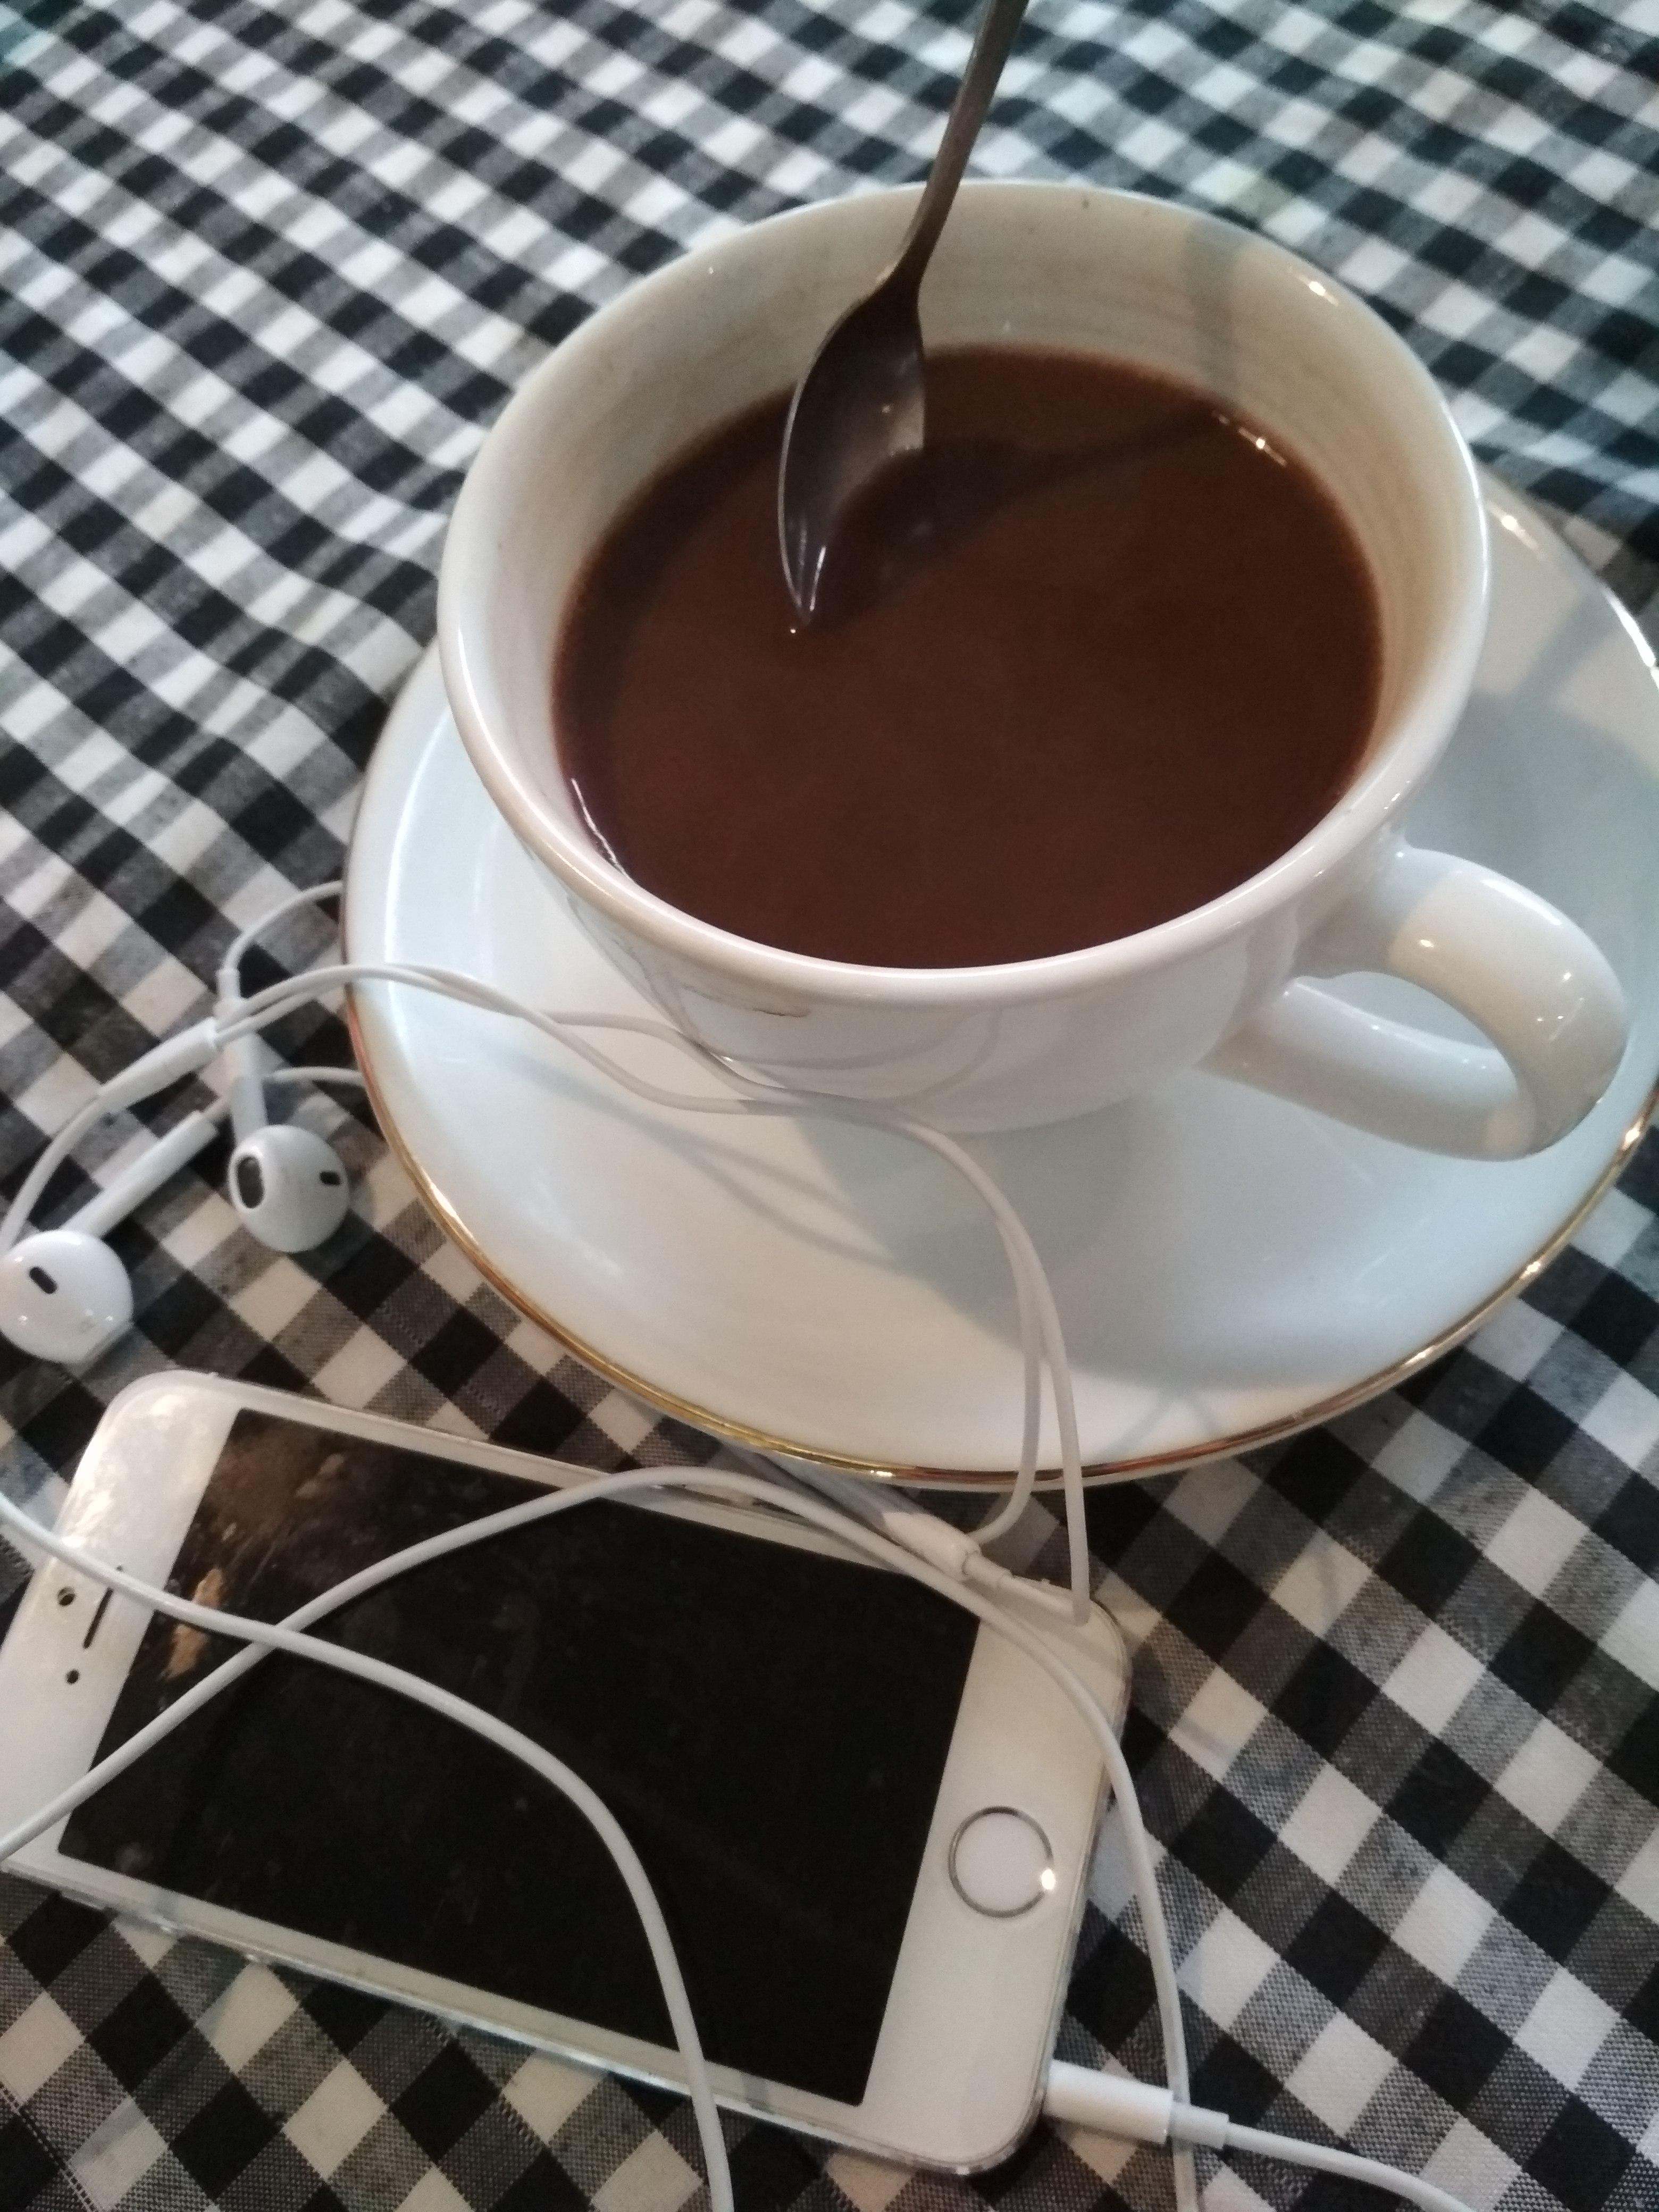 SECANGKIR HOT CHOCOLATE & HATIPUN BAHAGIA